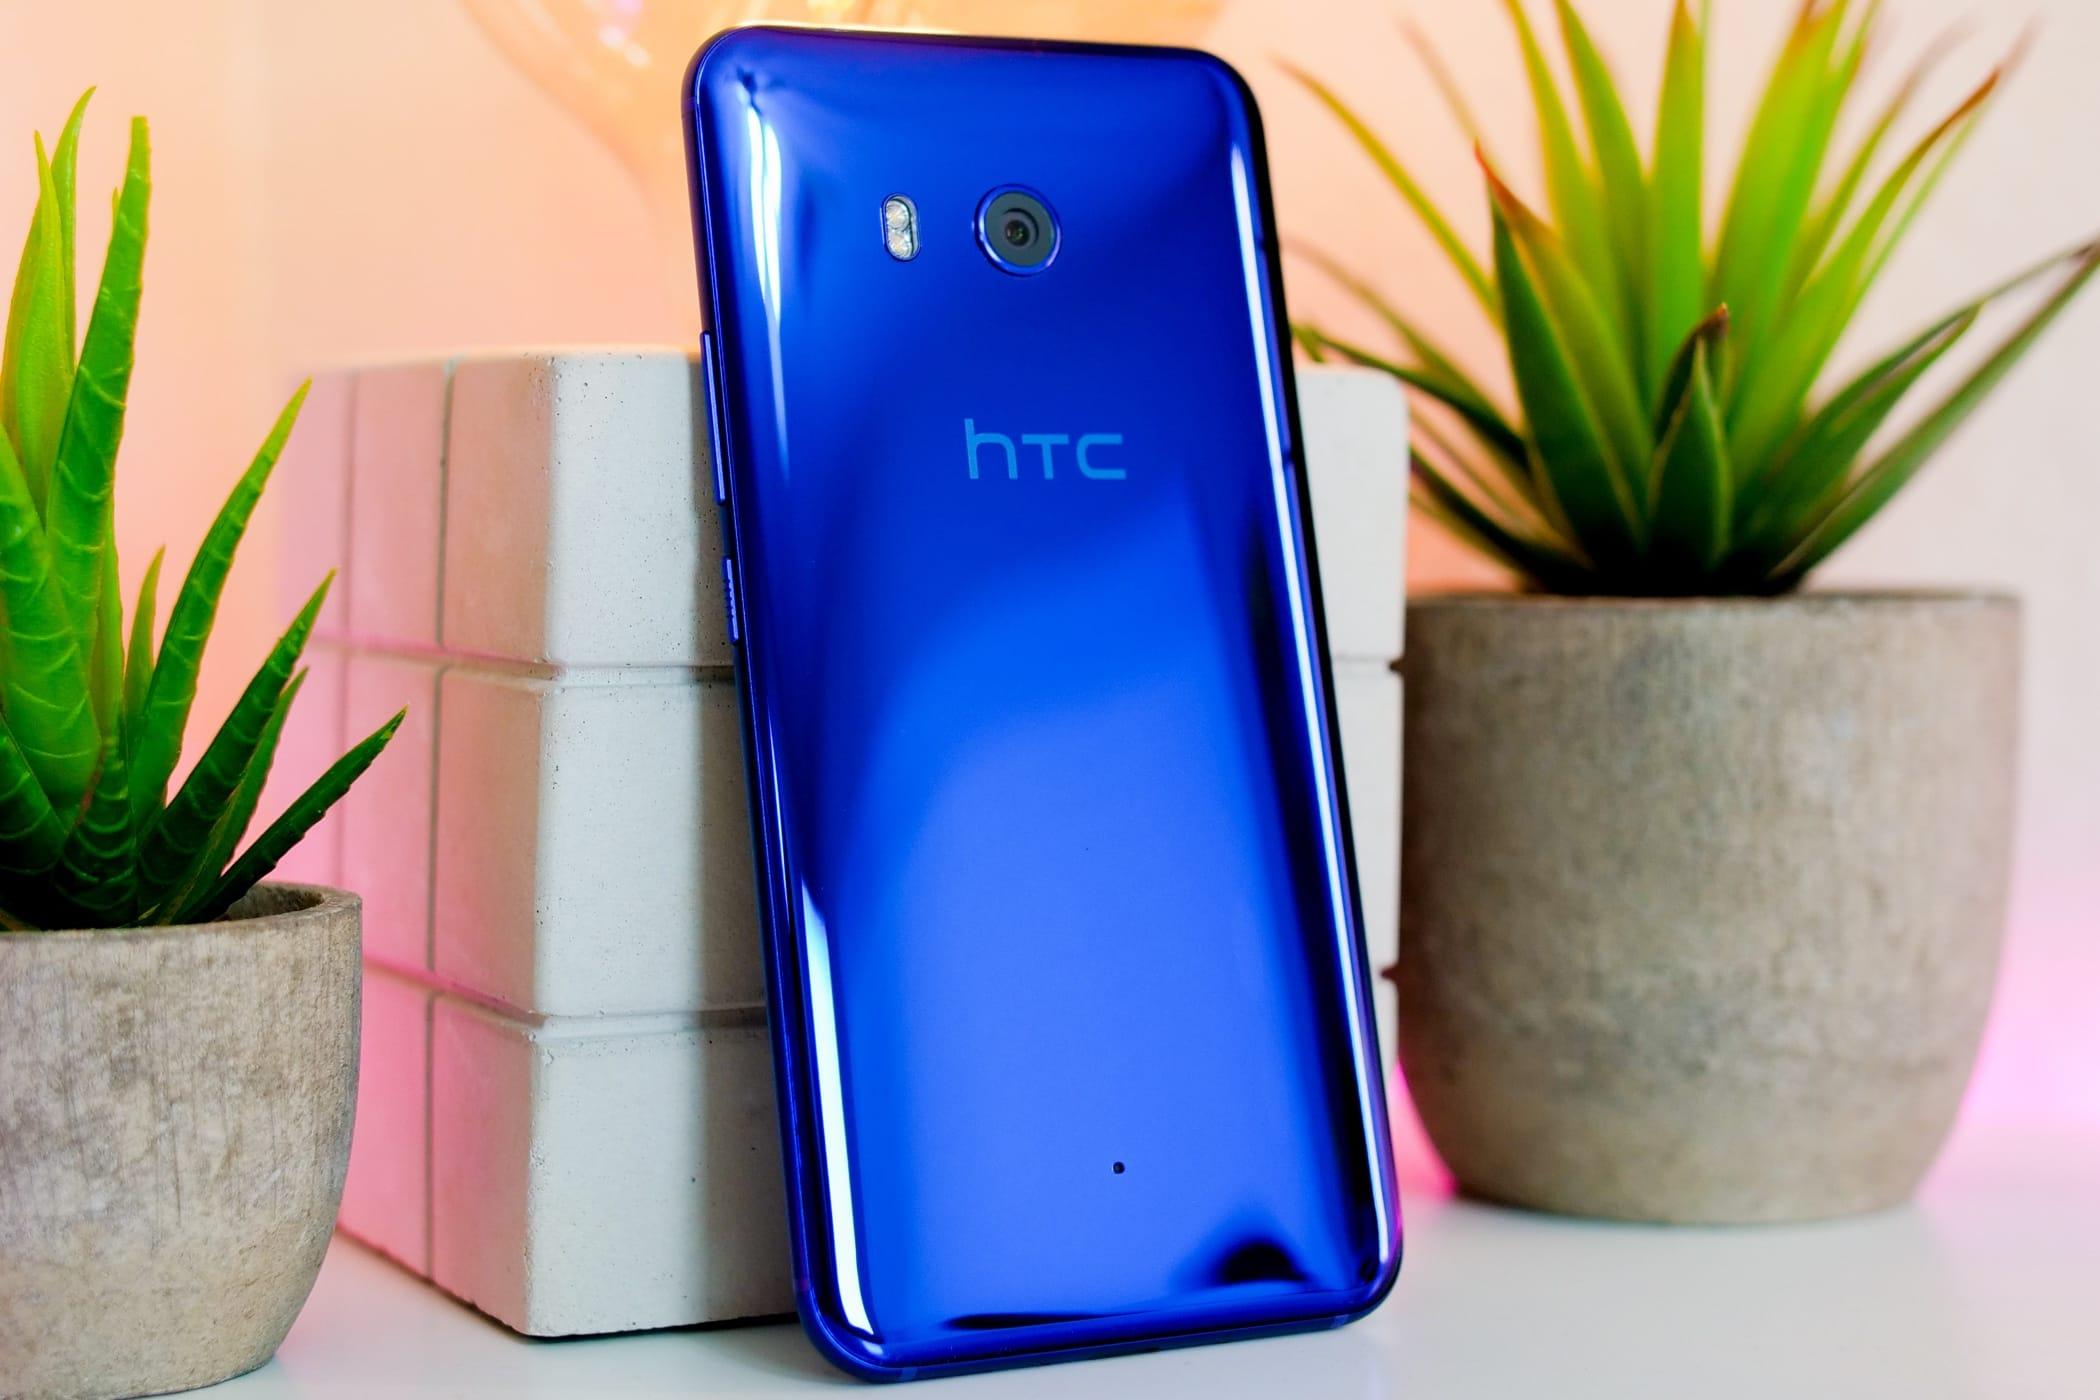 Всеть попали характеристики телефонов HTC Ocean Master, Harmony иLite— Слухи